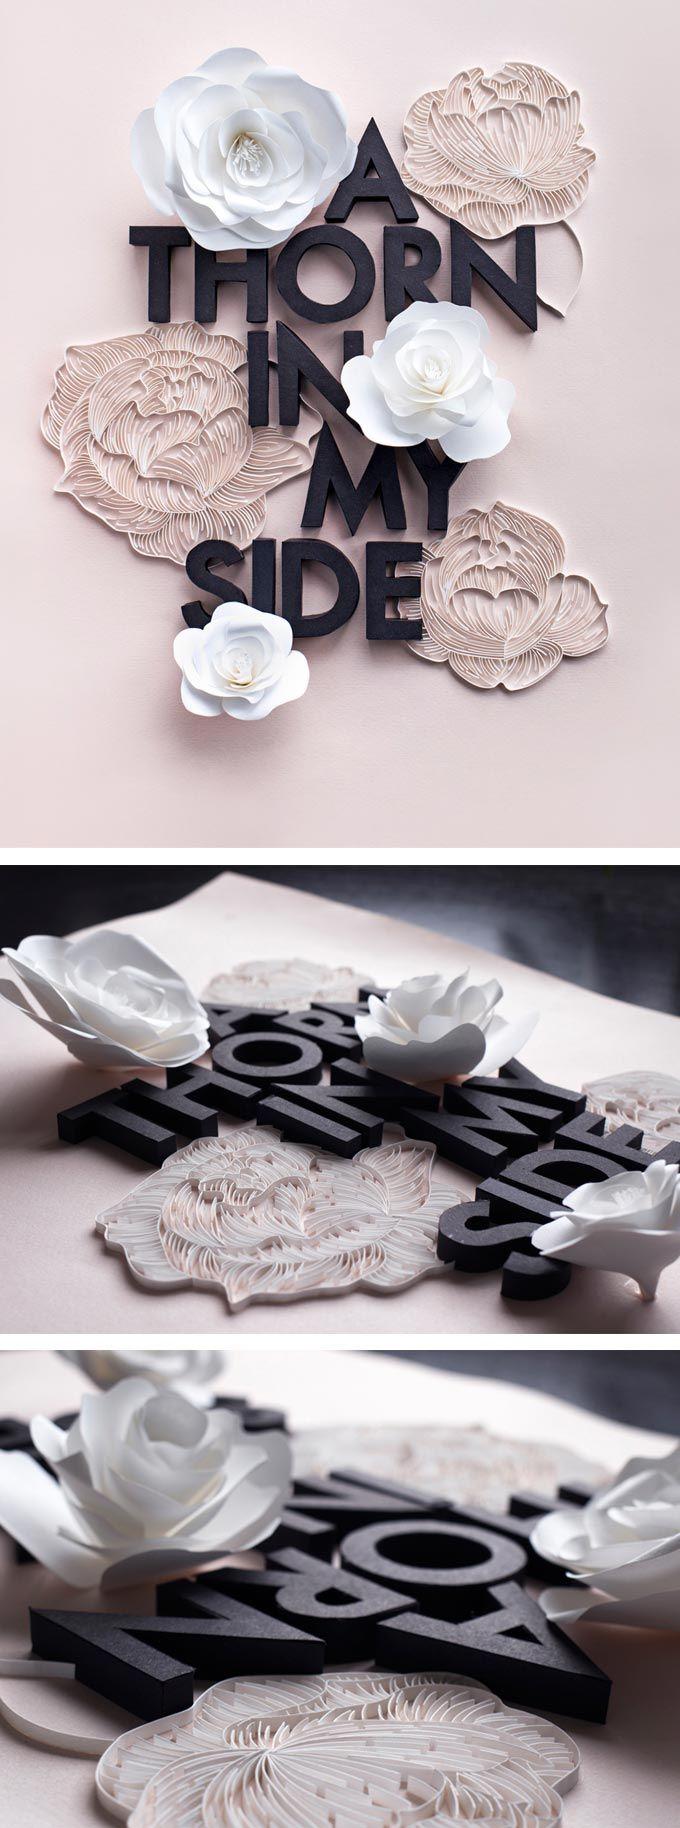 Lavanya Naidoo paper typography